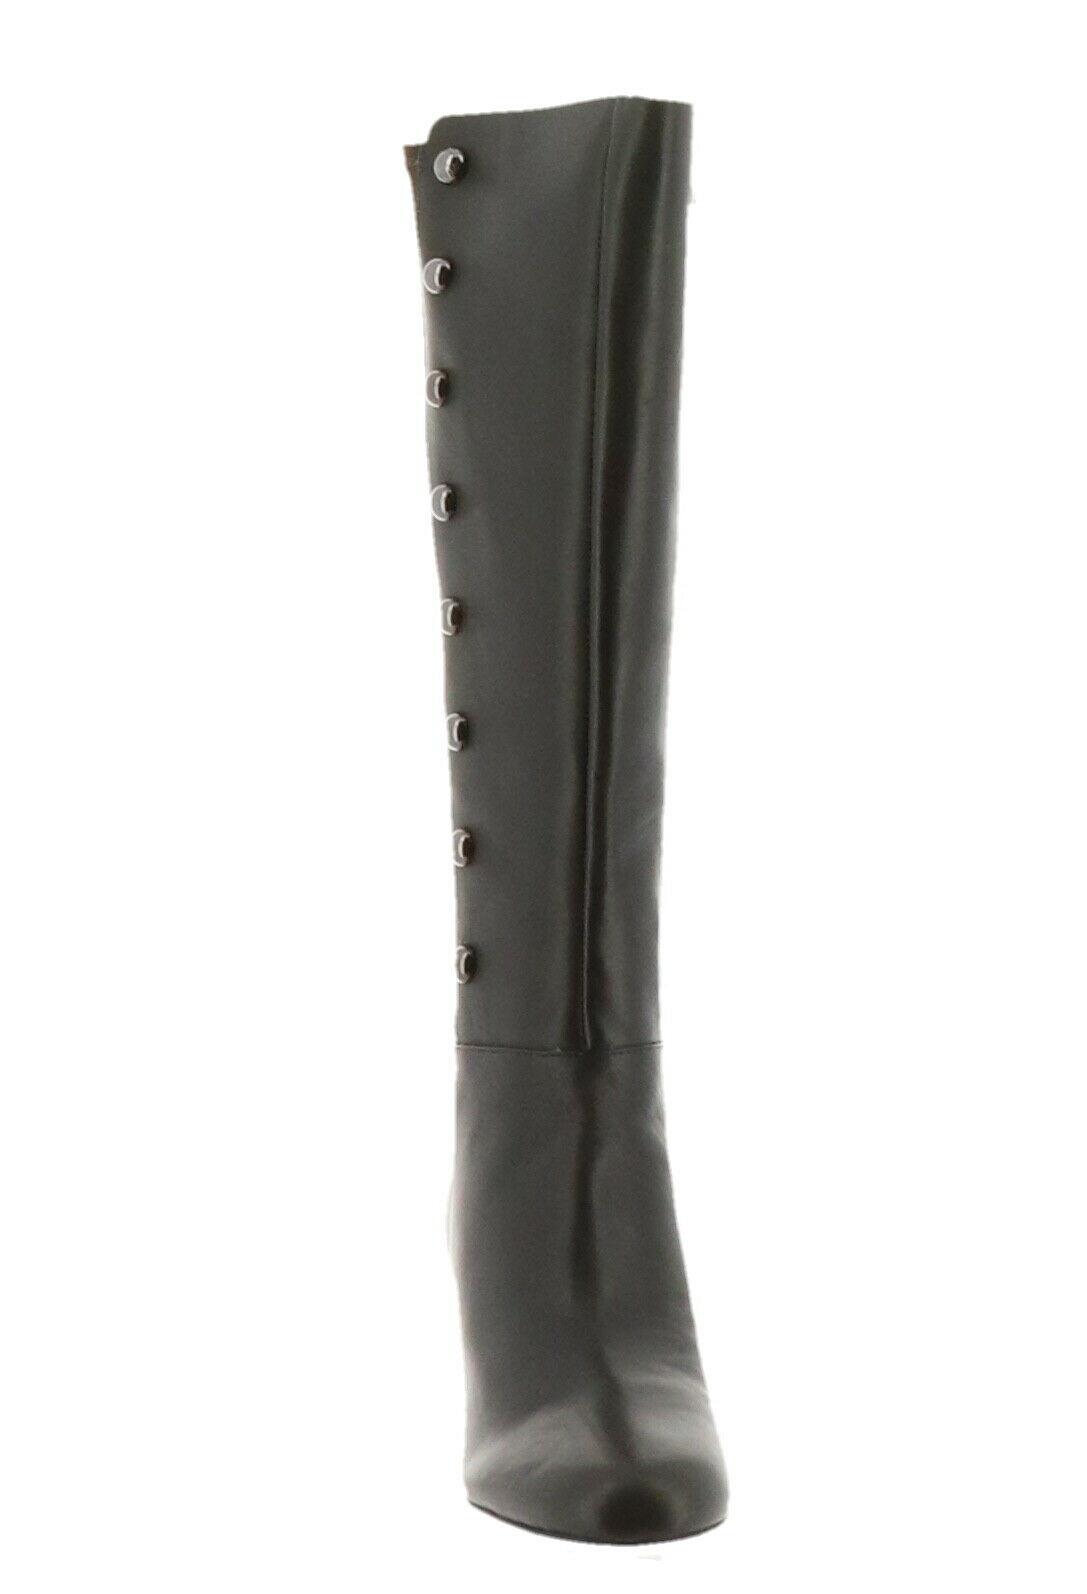 Isaac Mizrahi Leather Studded Tall Boots Block Heel Olive 8.5M NEW A297228